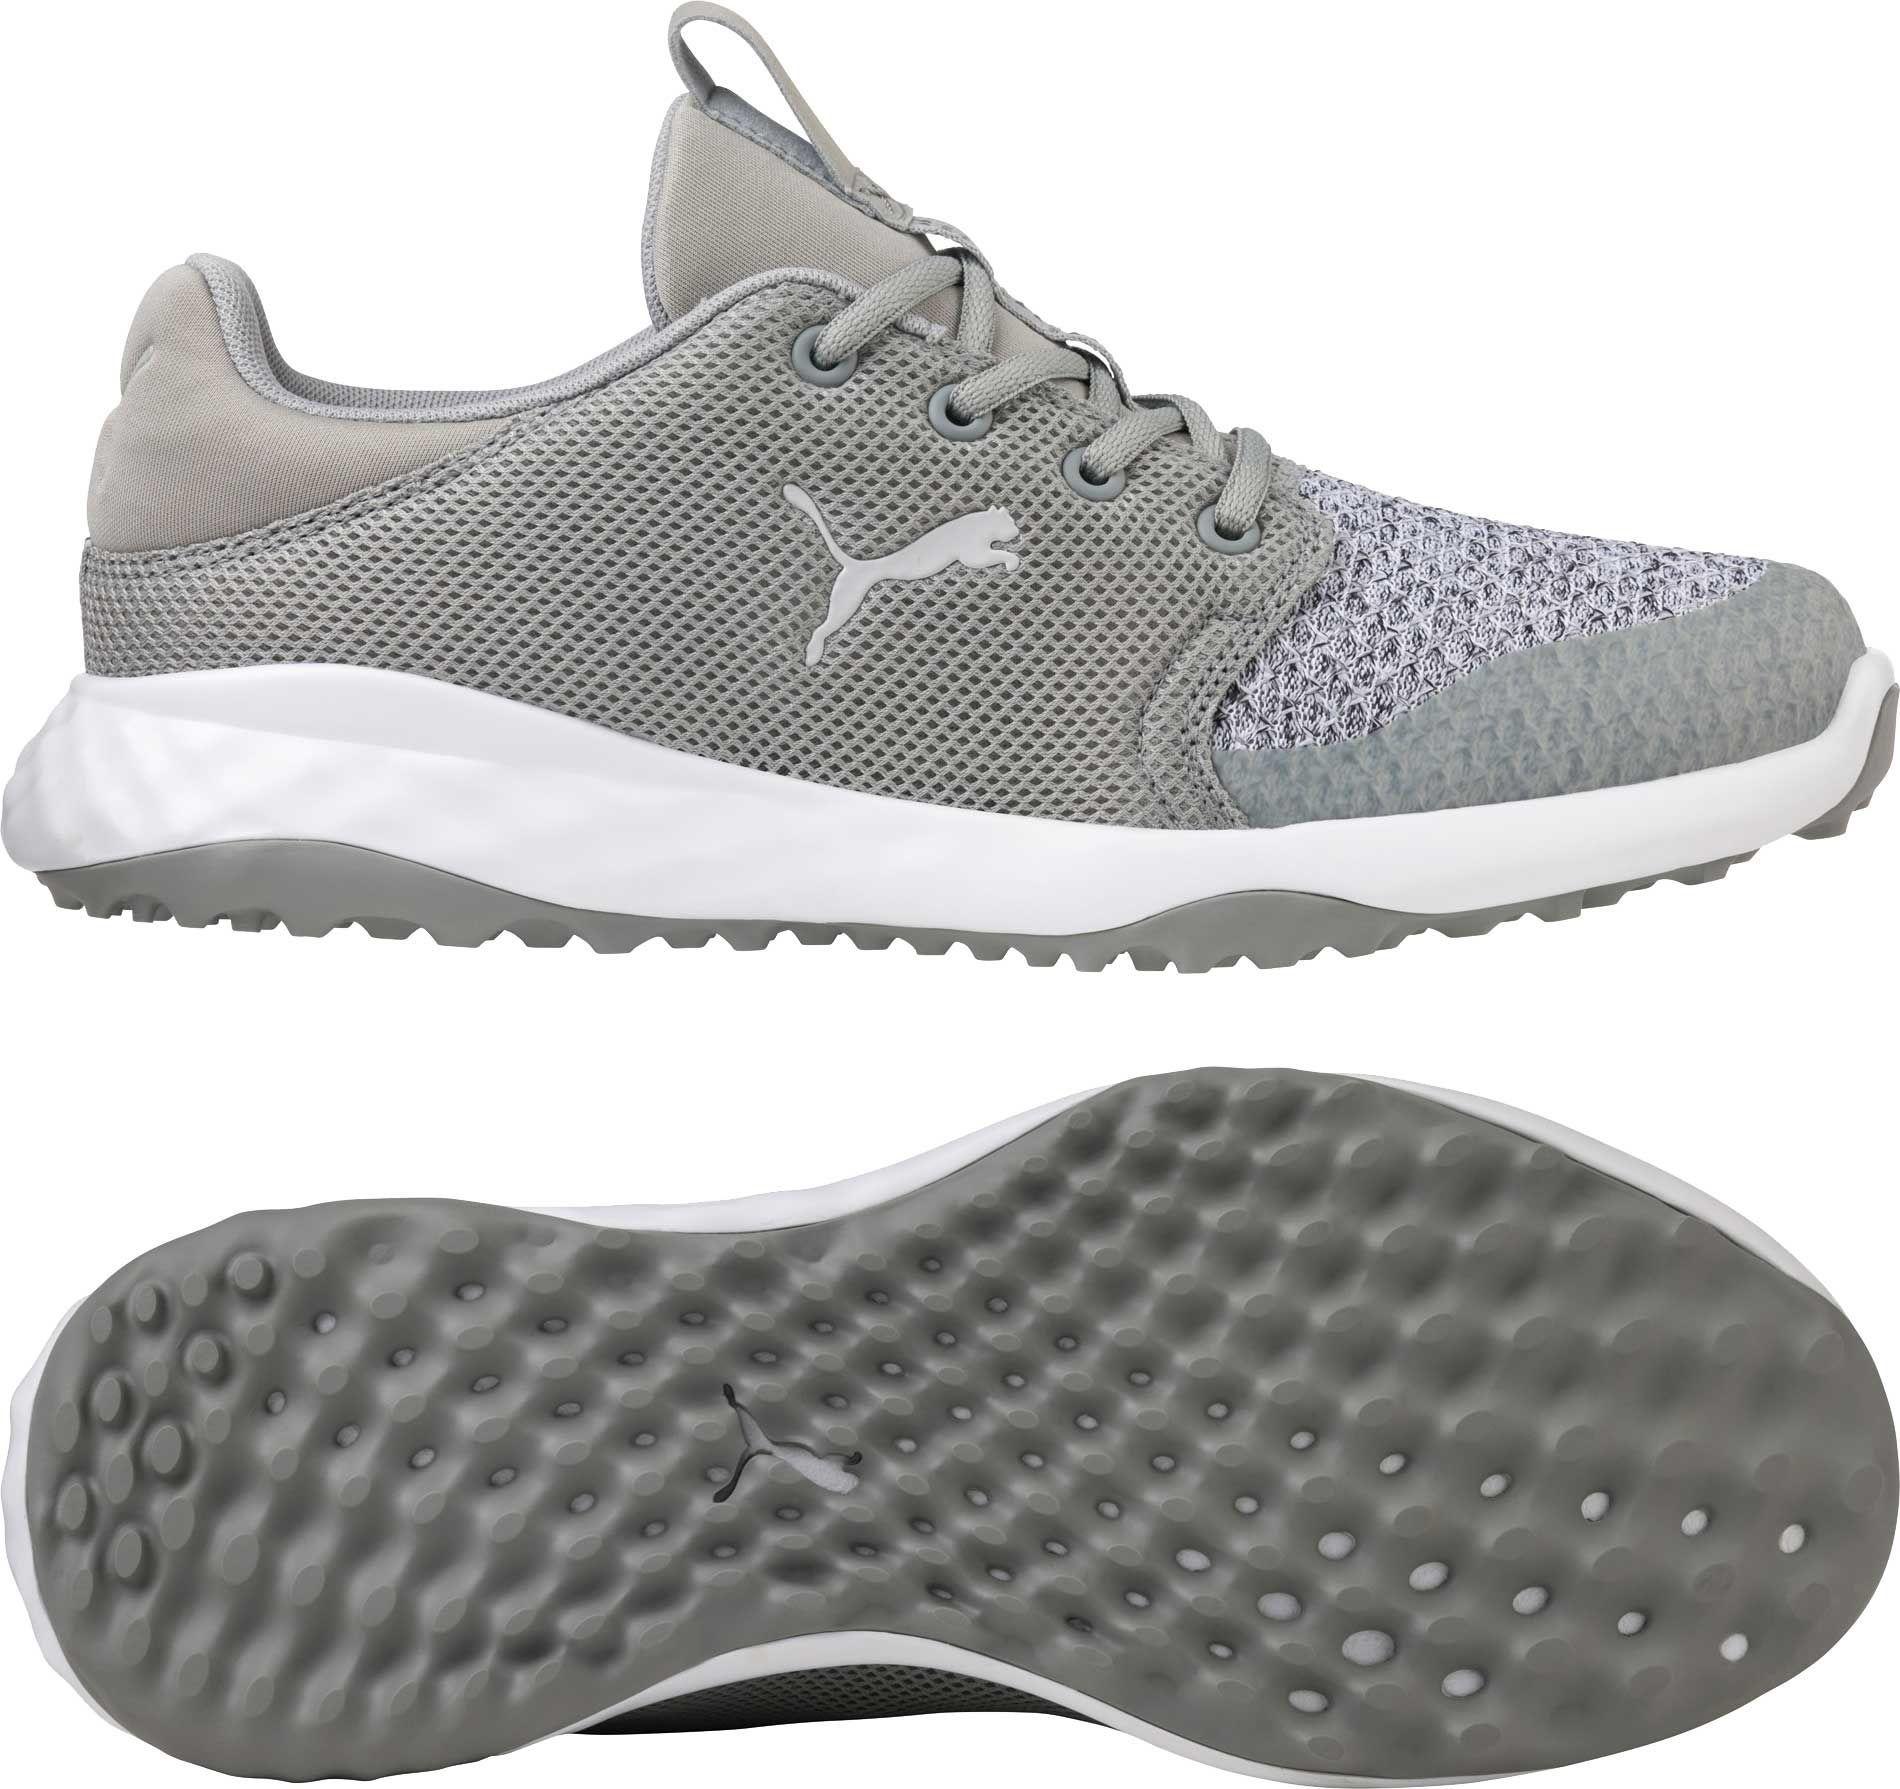 Puma Men's Grip Fusion Sport Golf Shoes | Fusion sport, Golf